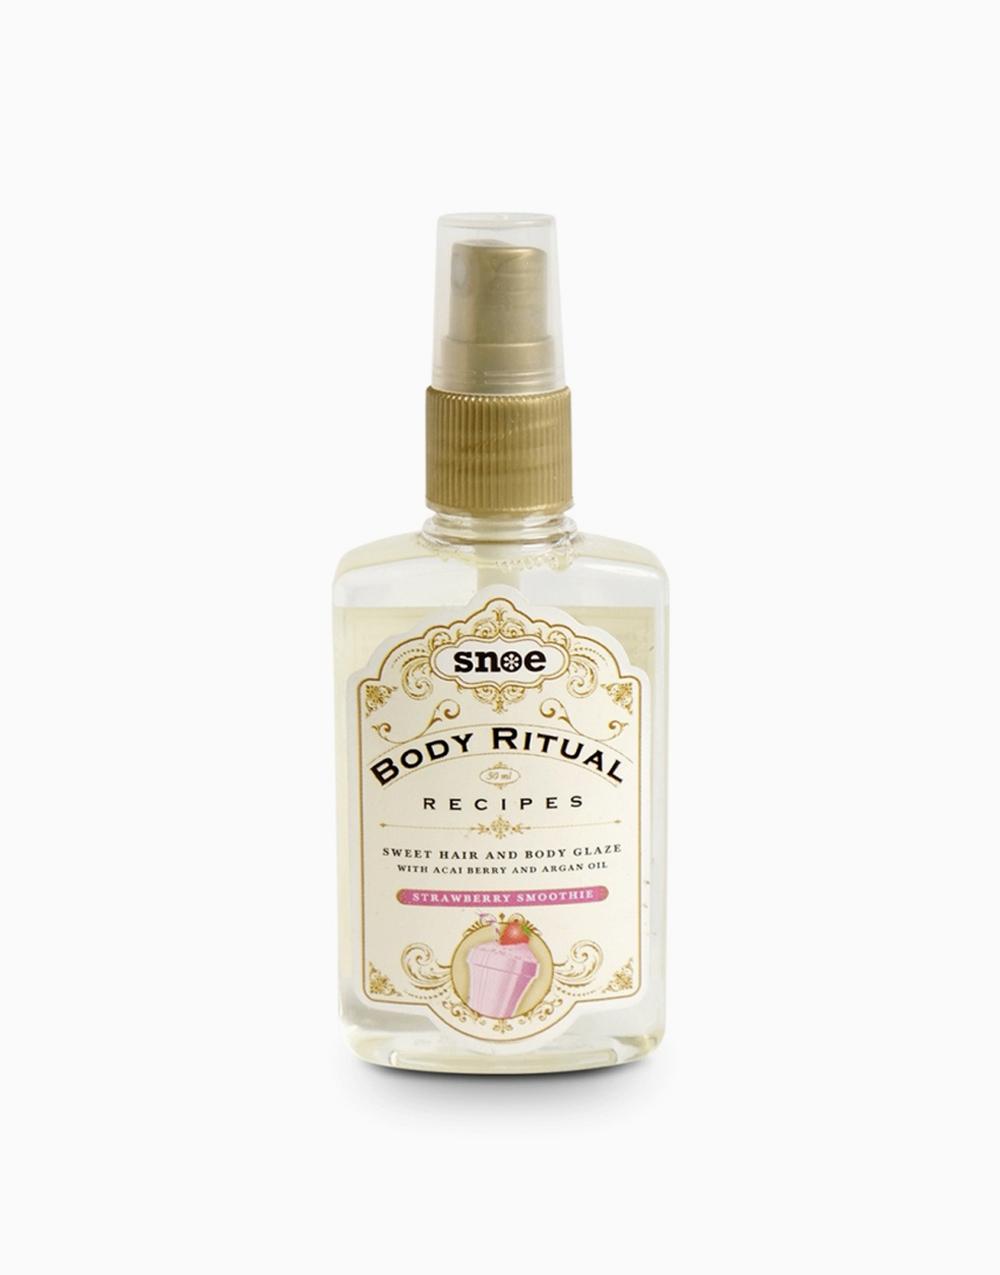 Body Ritual Recipes Sweet Hair & Body Glaze by Snoe Beauty | Strawberry Smoothie